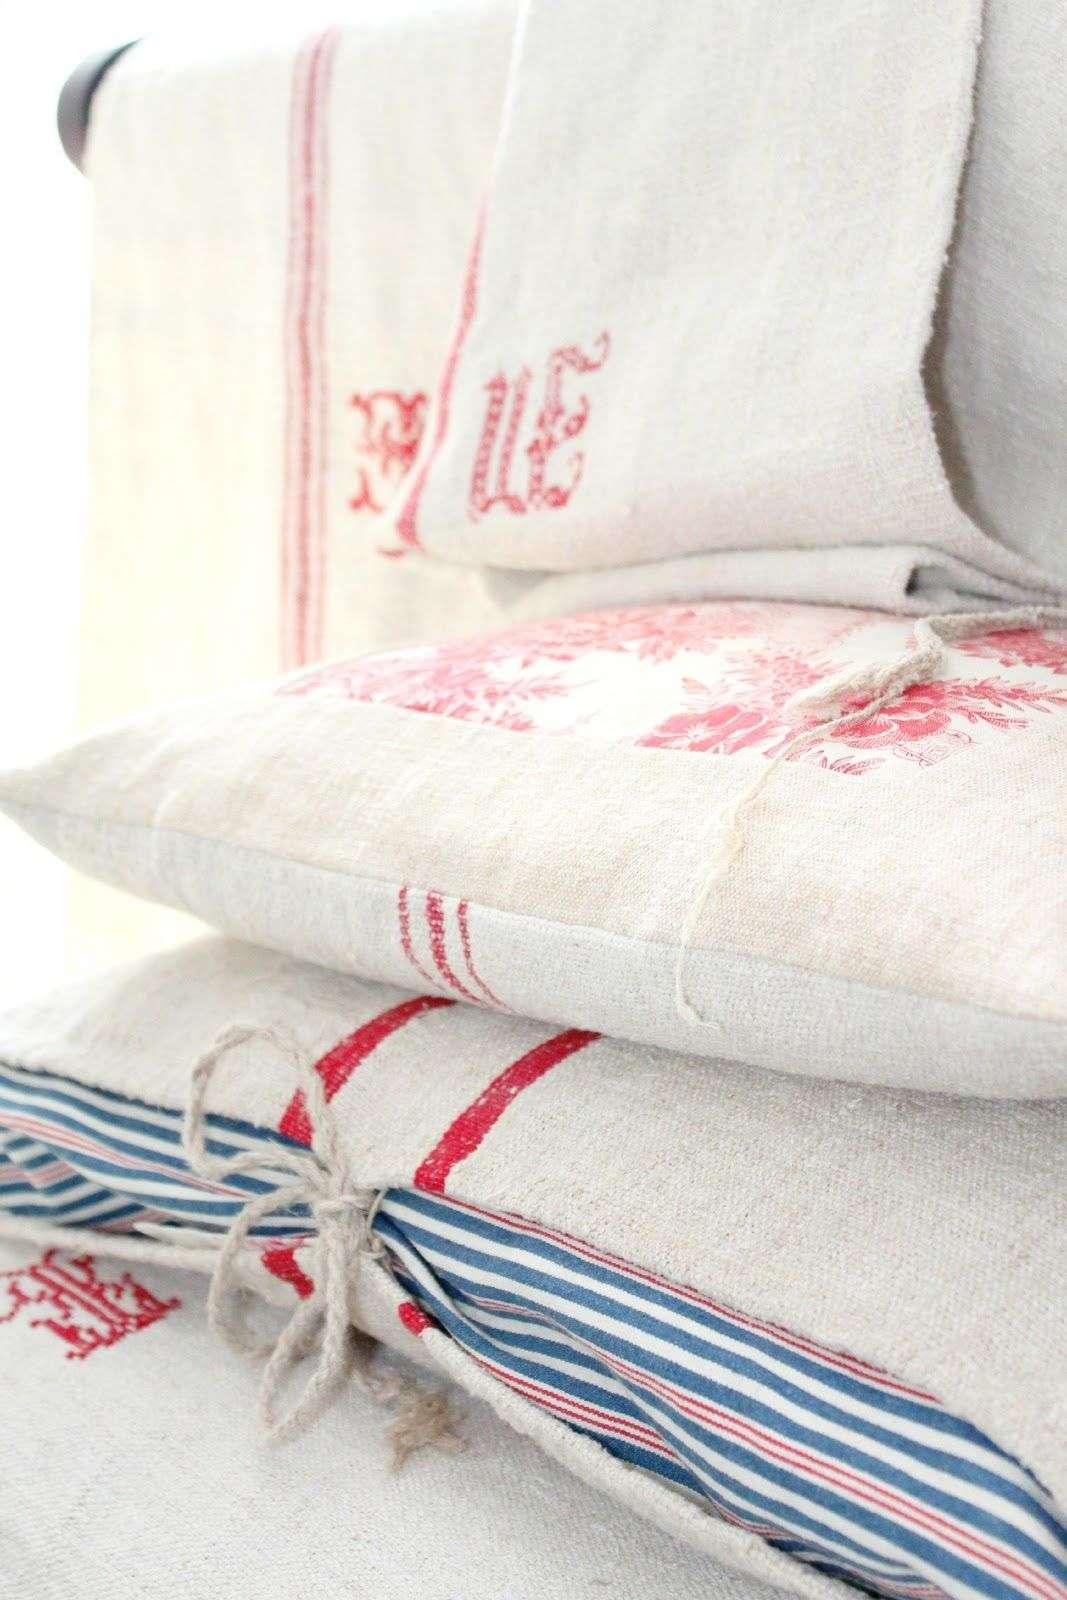 fench bedroom linens